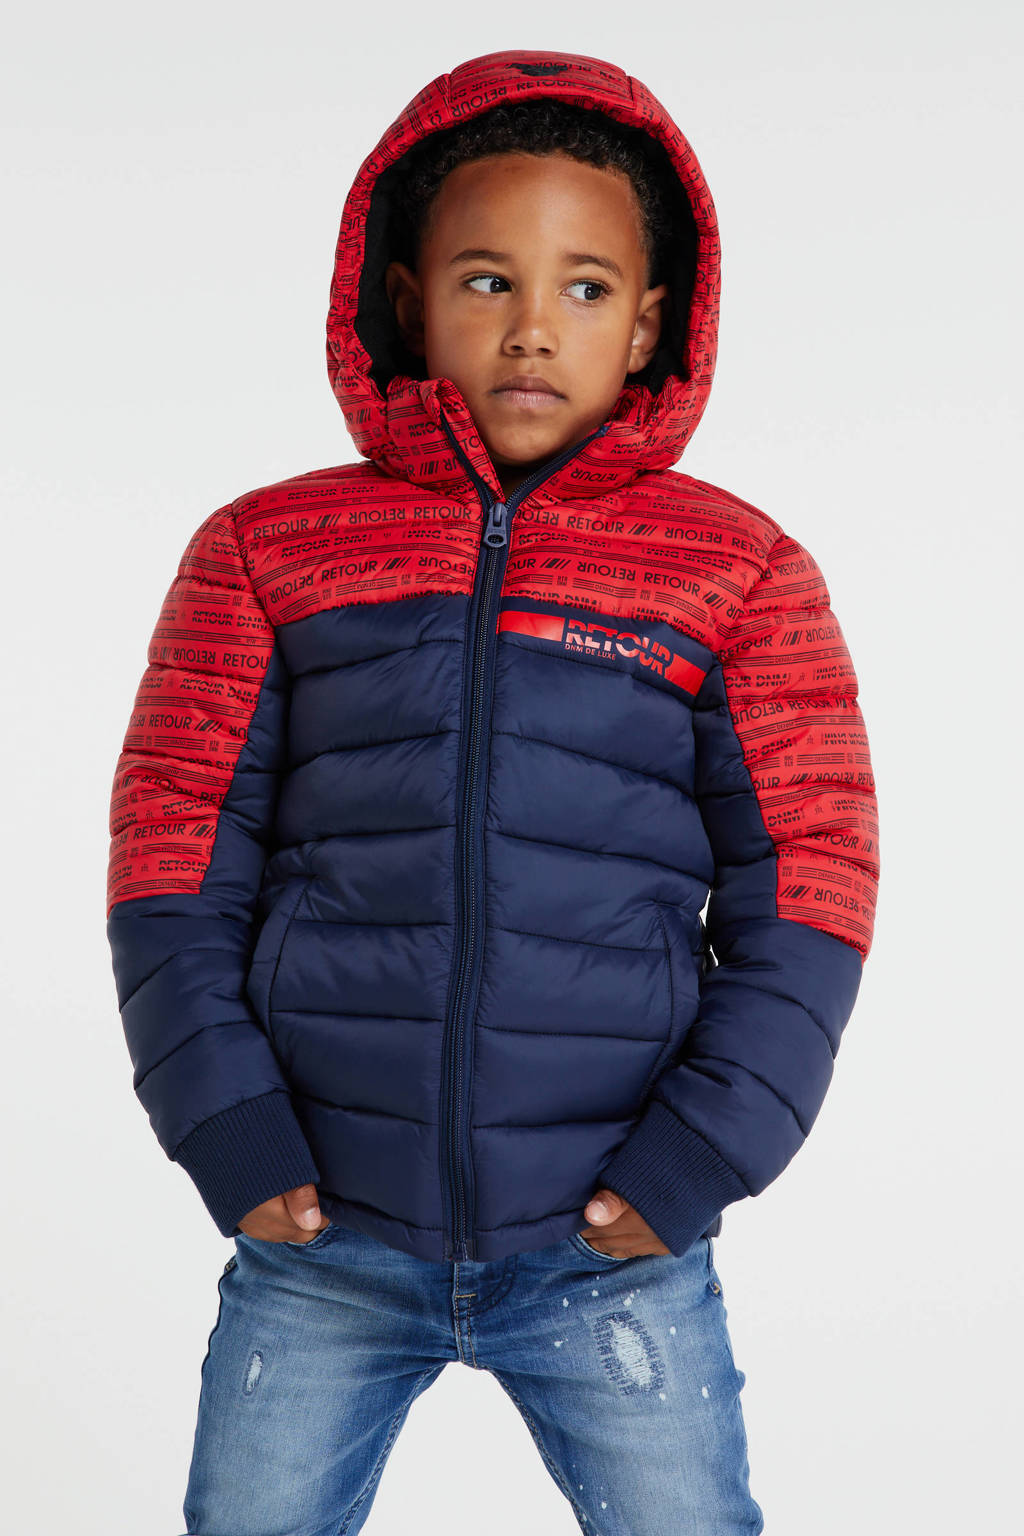 Retour Denim gewatteerde winterjas Terence rood/blauw, Rood/blauw